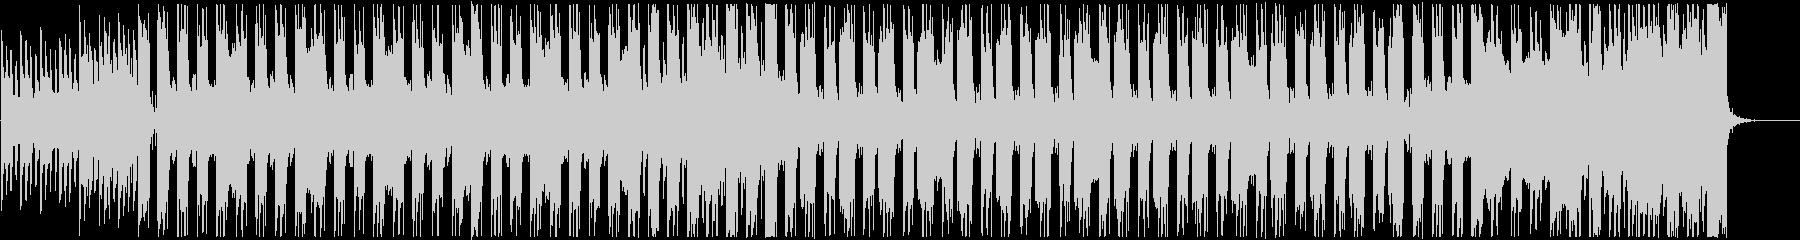 Wild EDM_Future Bass's unreproduced waveform